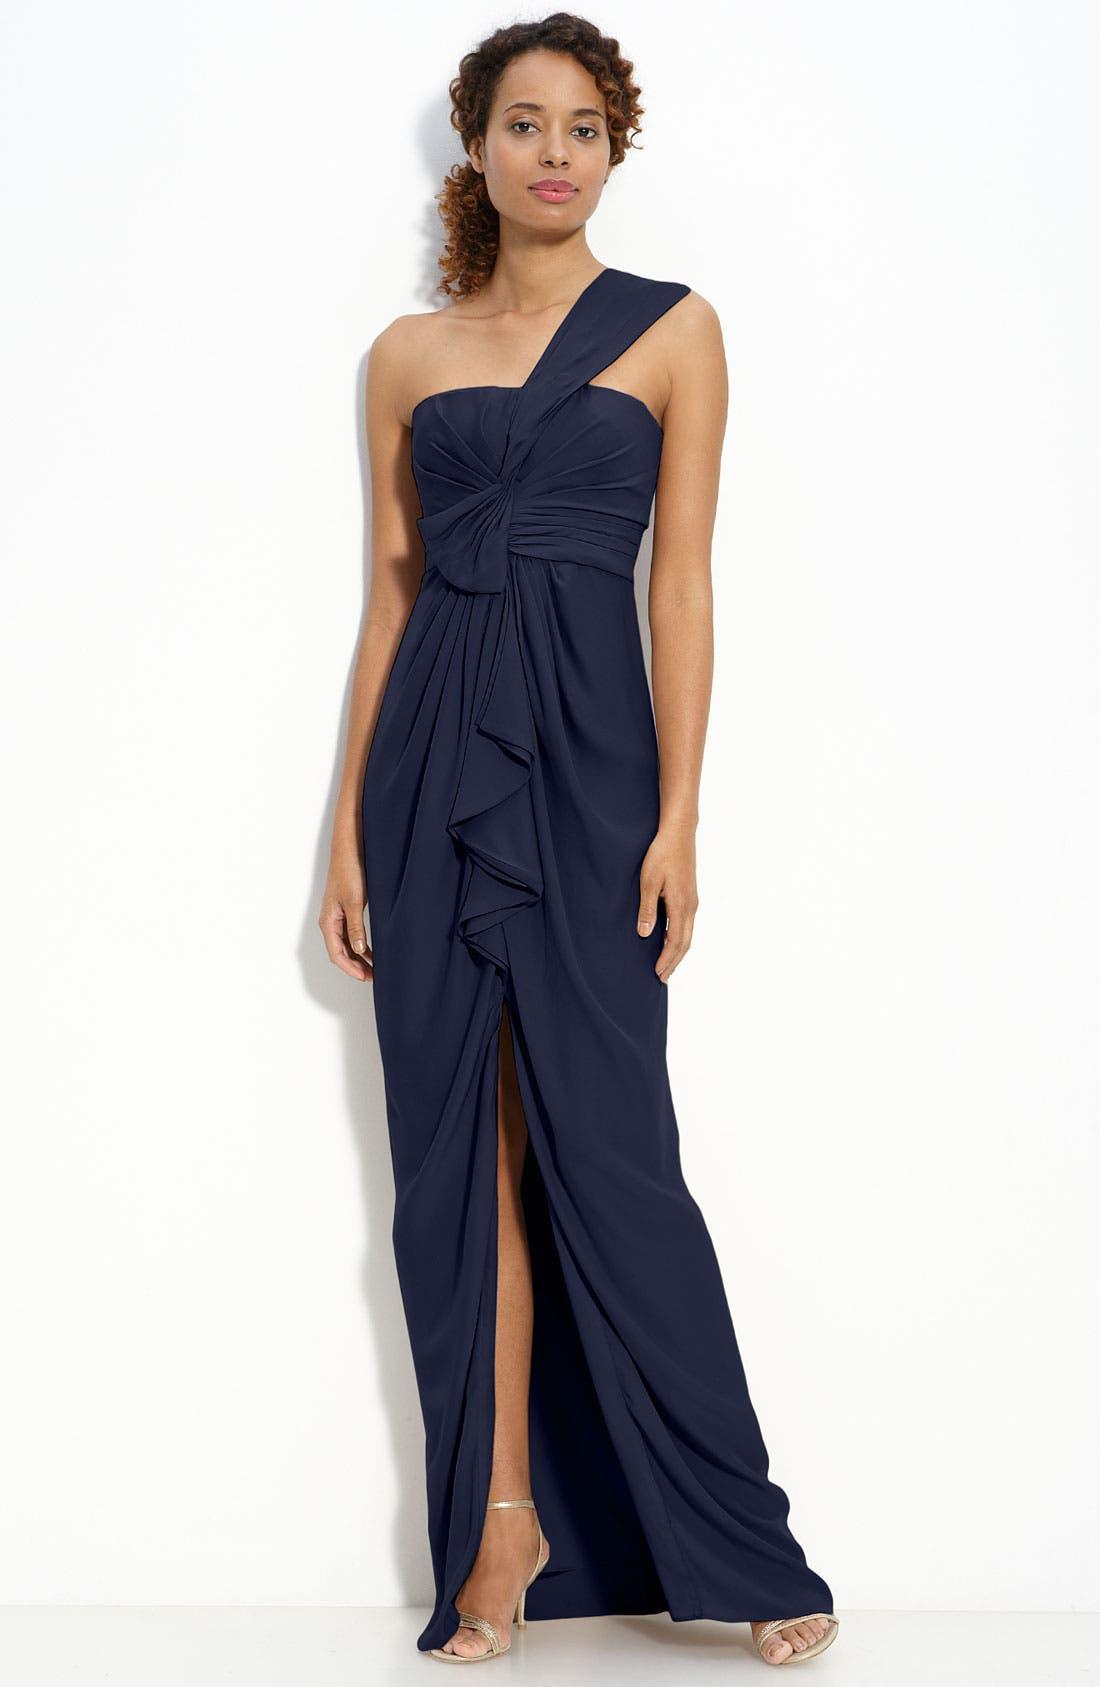 Main Image - BCBGMAXAZRIA Ruffle Front One Shoulder Satin Gown